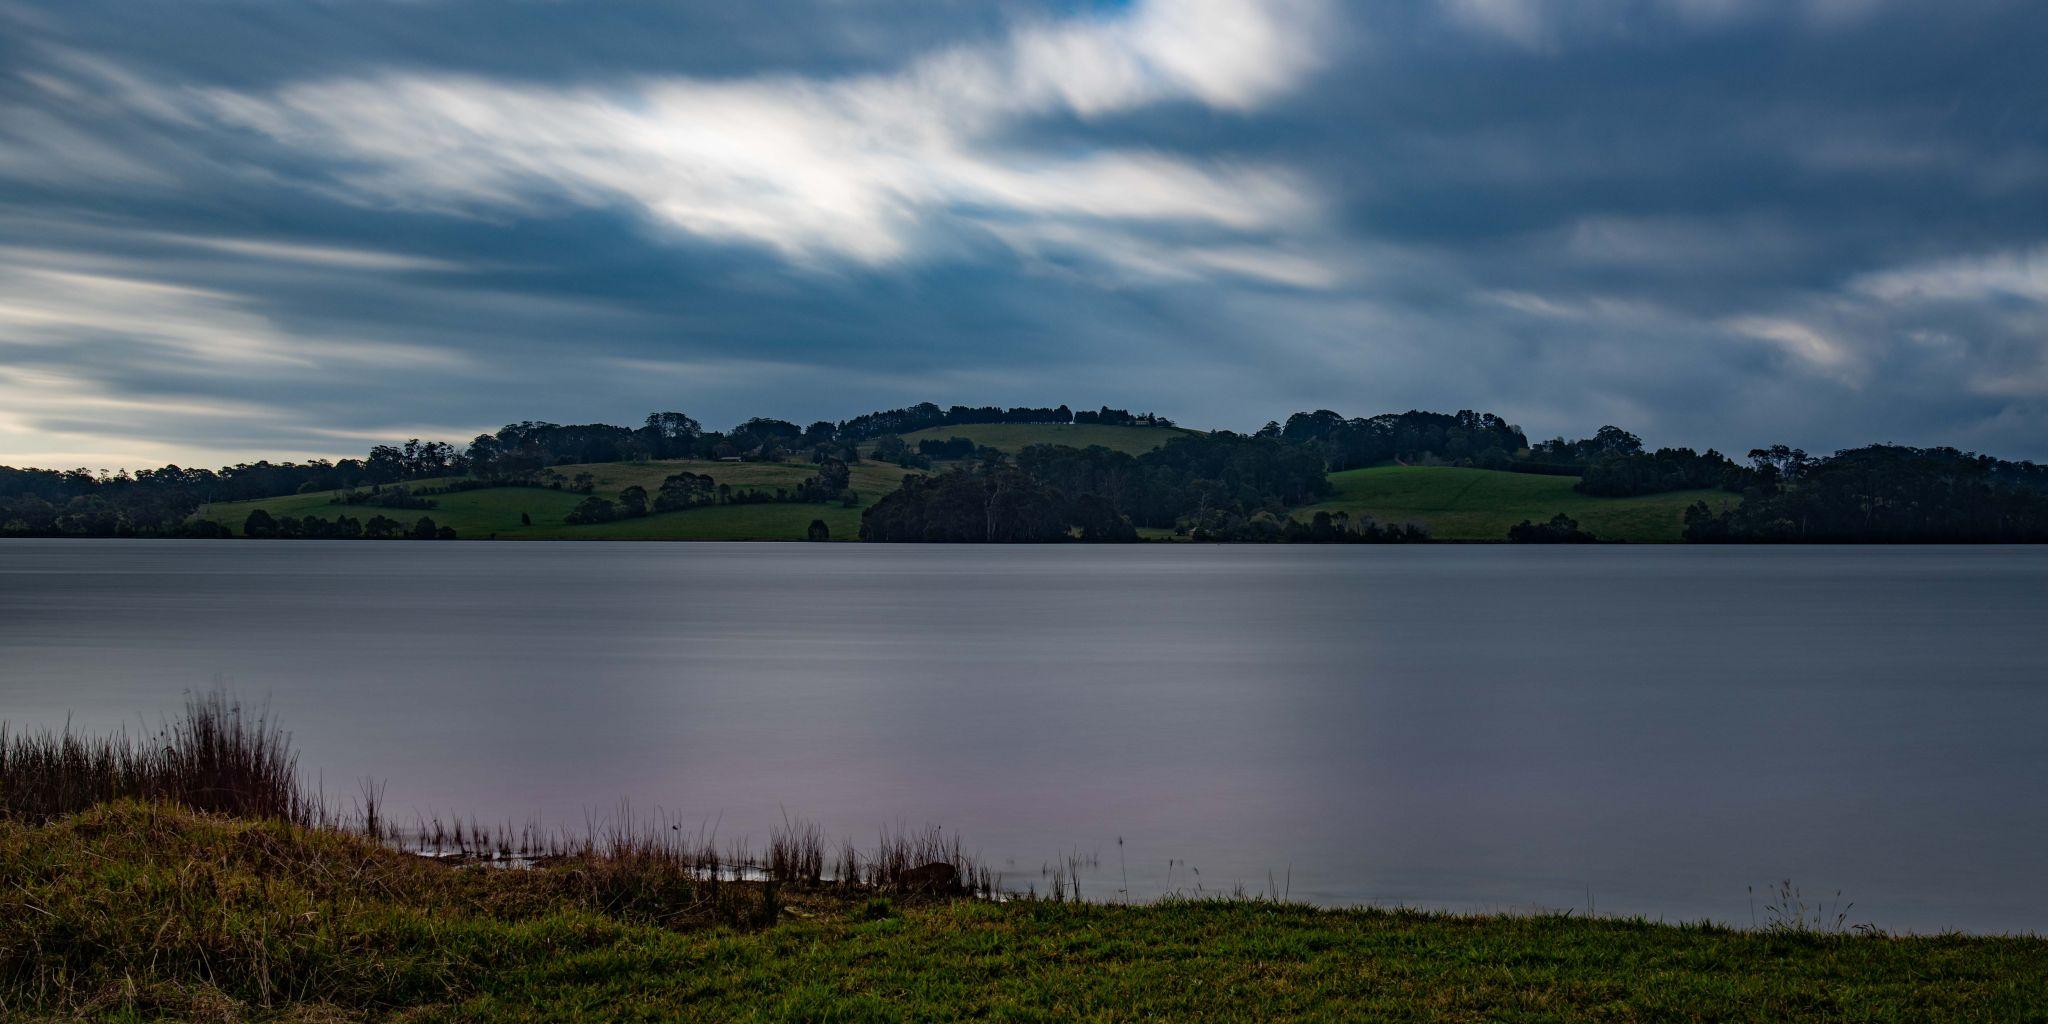 Fitzroy falls reservoir, Australia